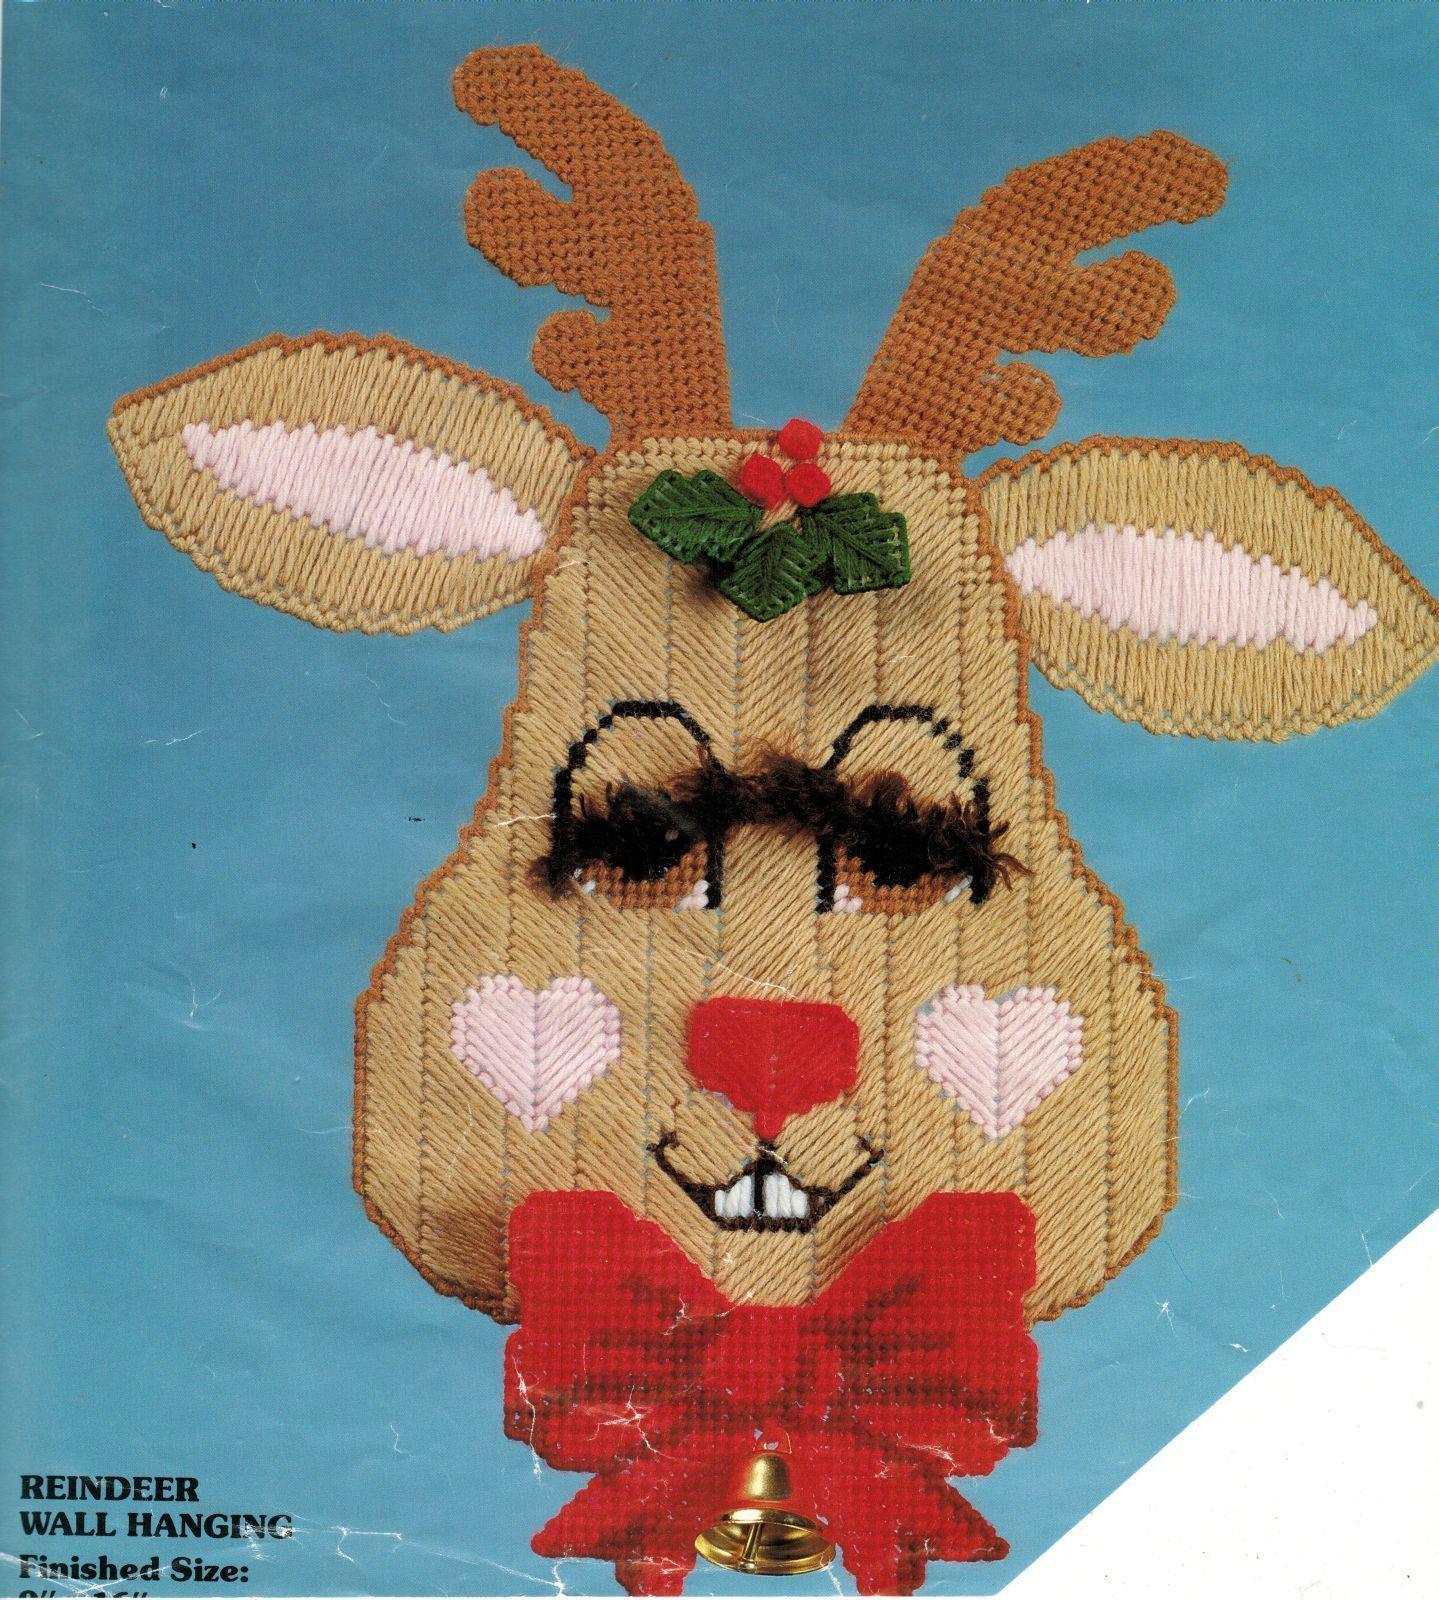 "Plastic Canvas Distlefink Christmas Reindeer Wall Hanging Kit 9"" x 16"" - $13.99"